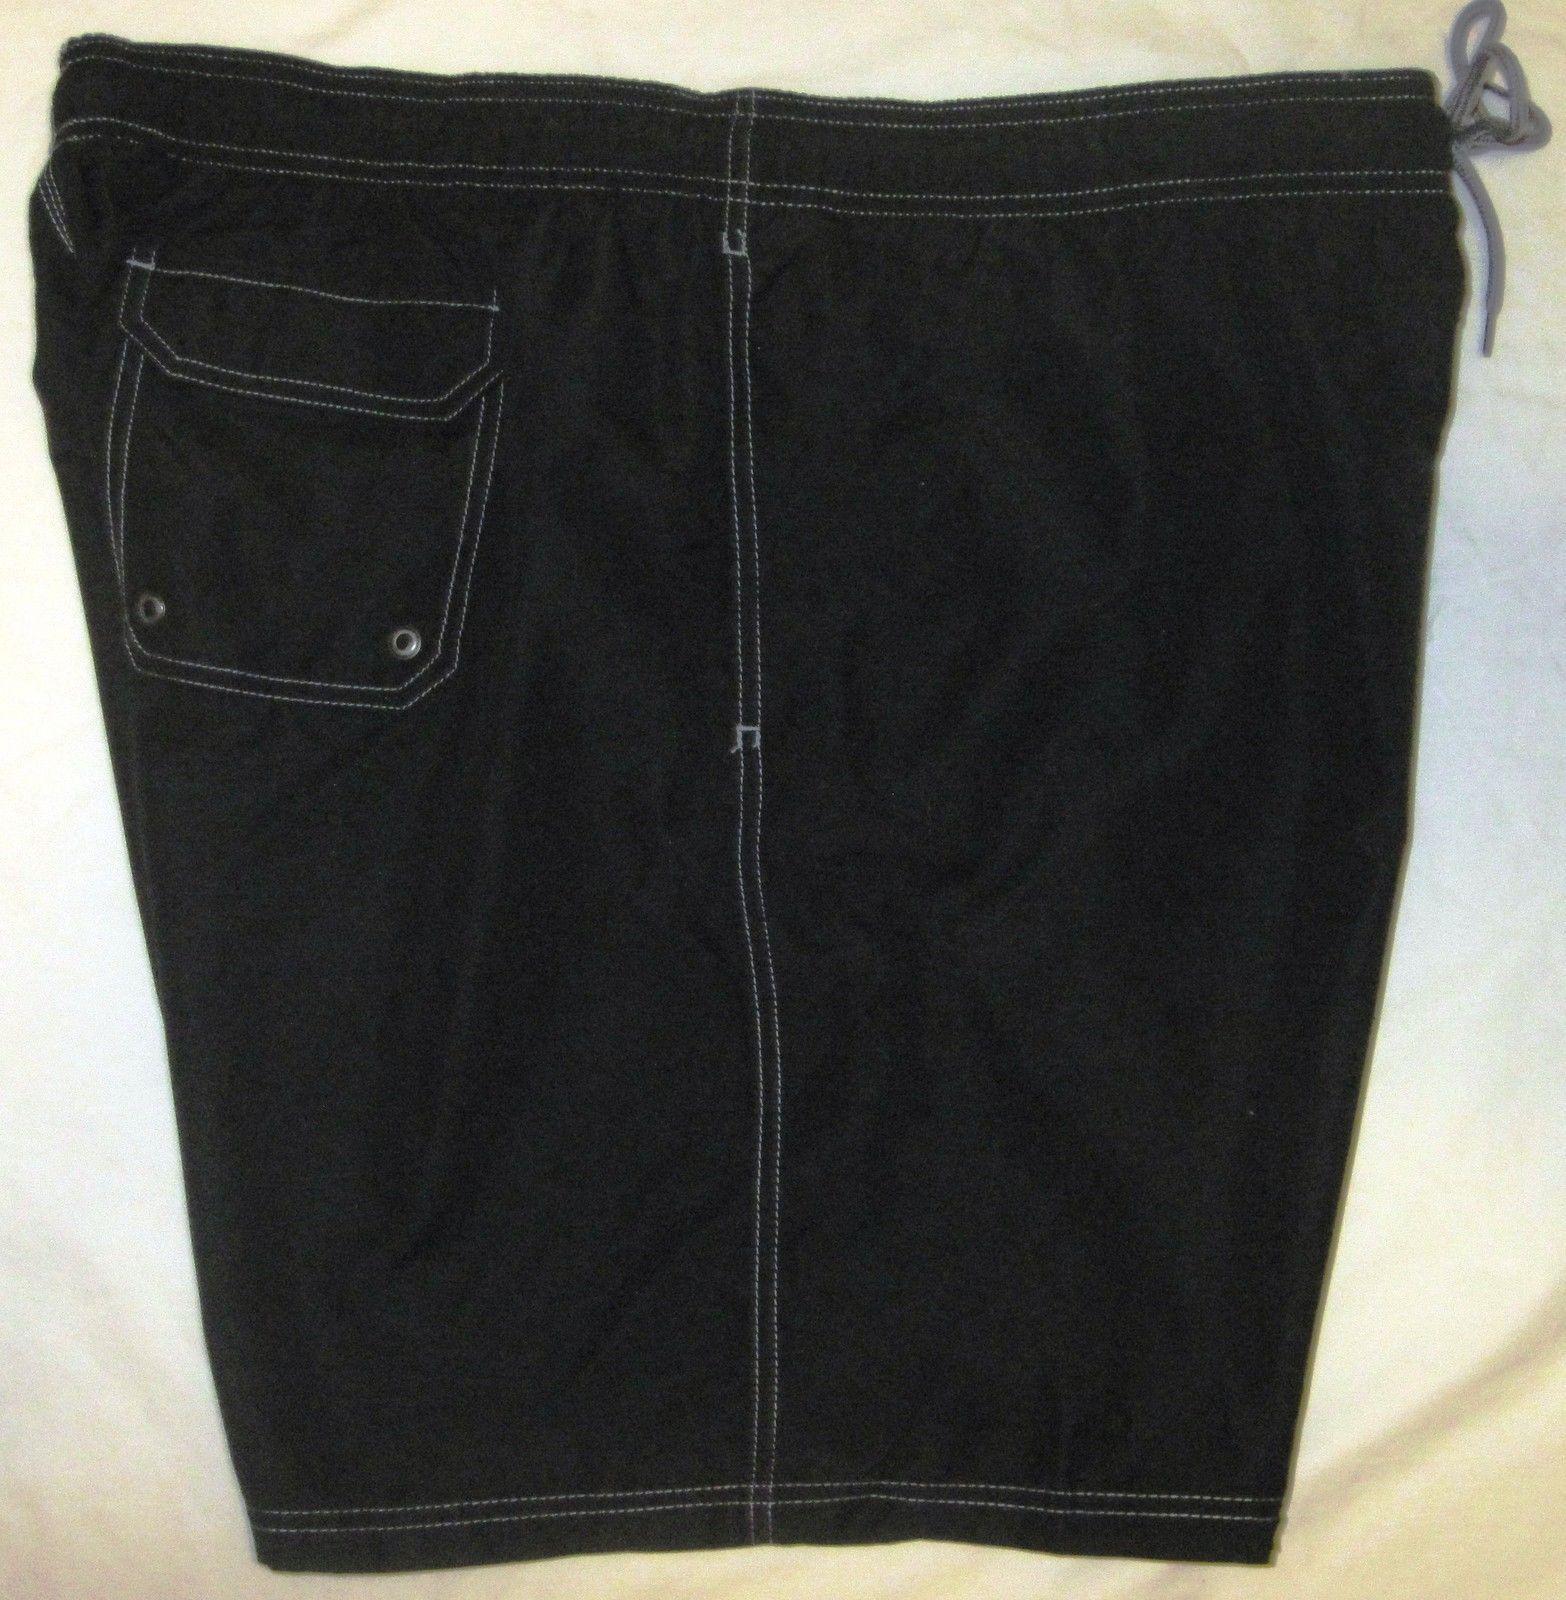 NWT CROFT & BARROW Swim Bathing Suit Trunks Mens XXL black or gray solid Poly image 6